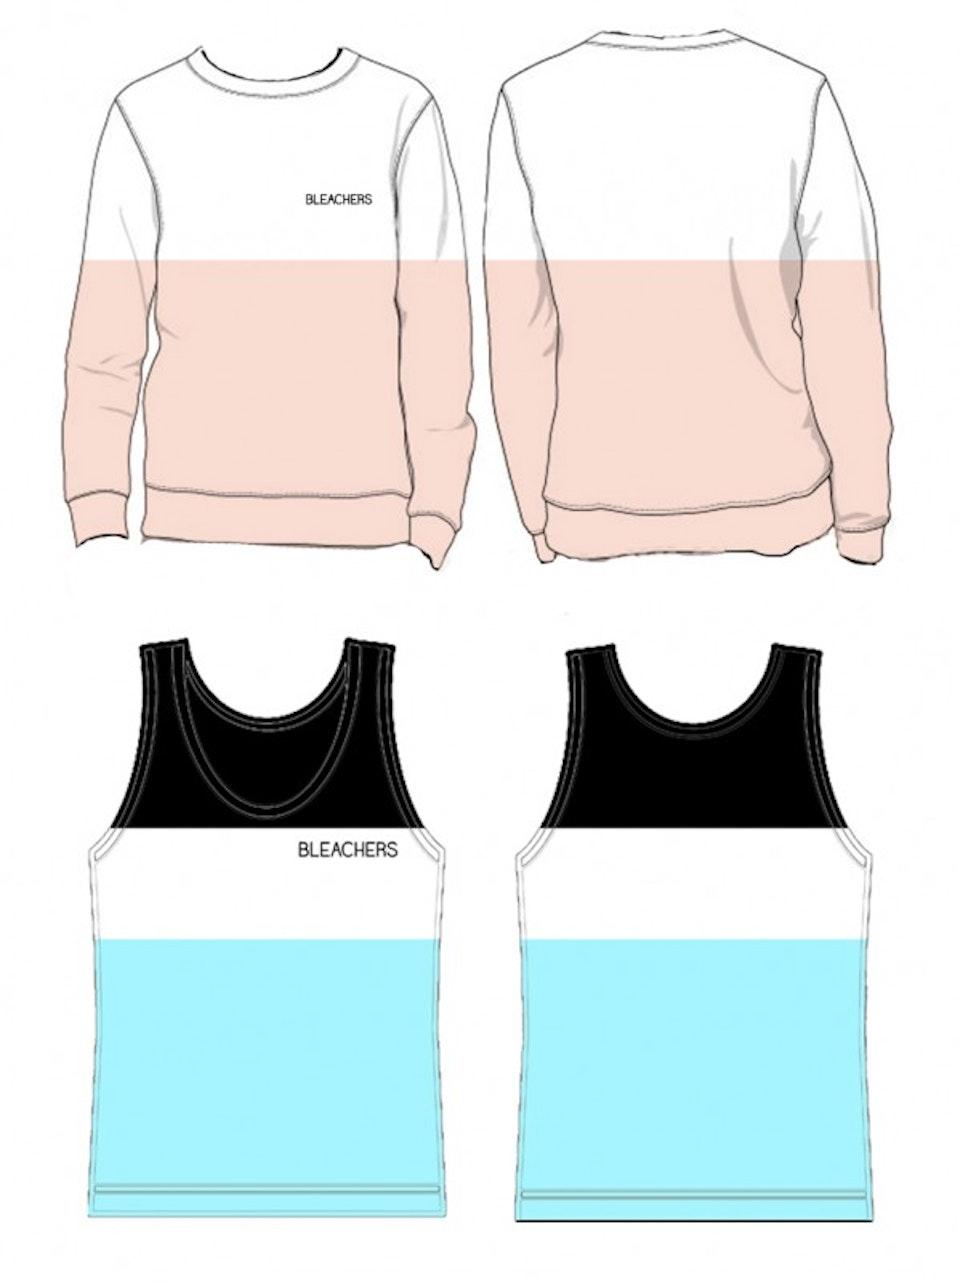 Tour Merch - Sweatshirt and tank